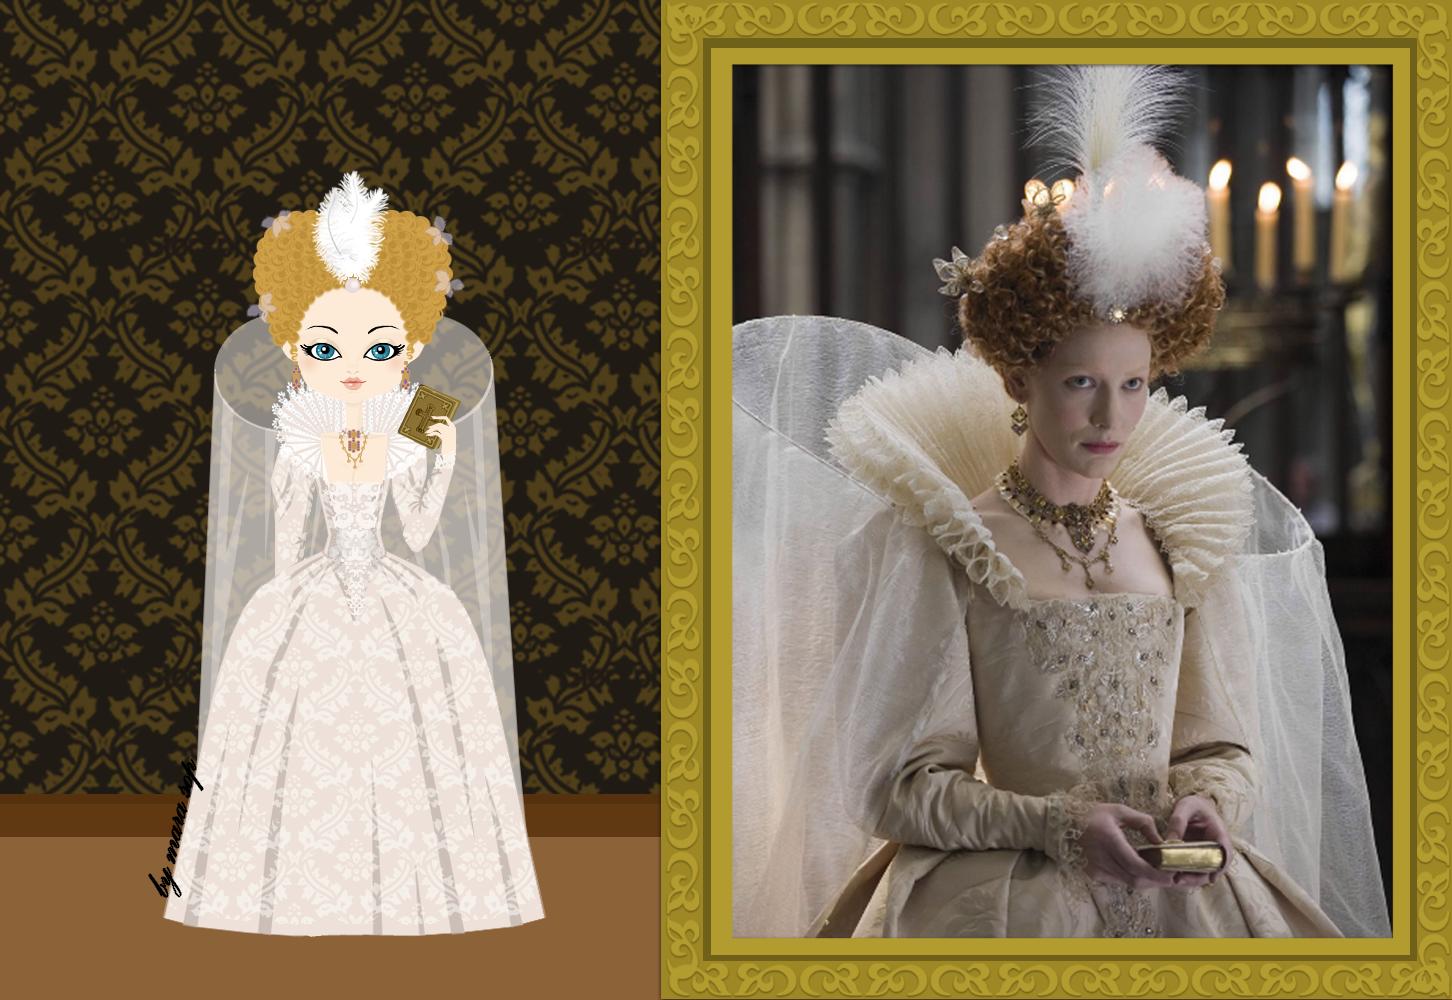 Queen Elizabeth I of England, a costume from Elizabeth